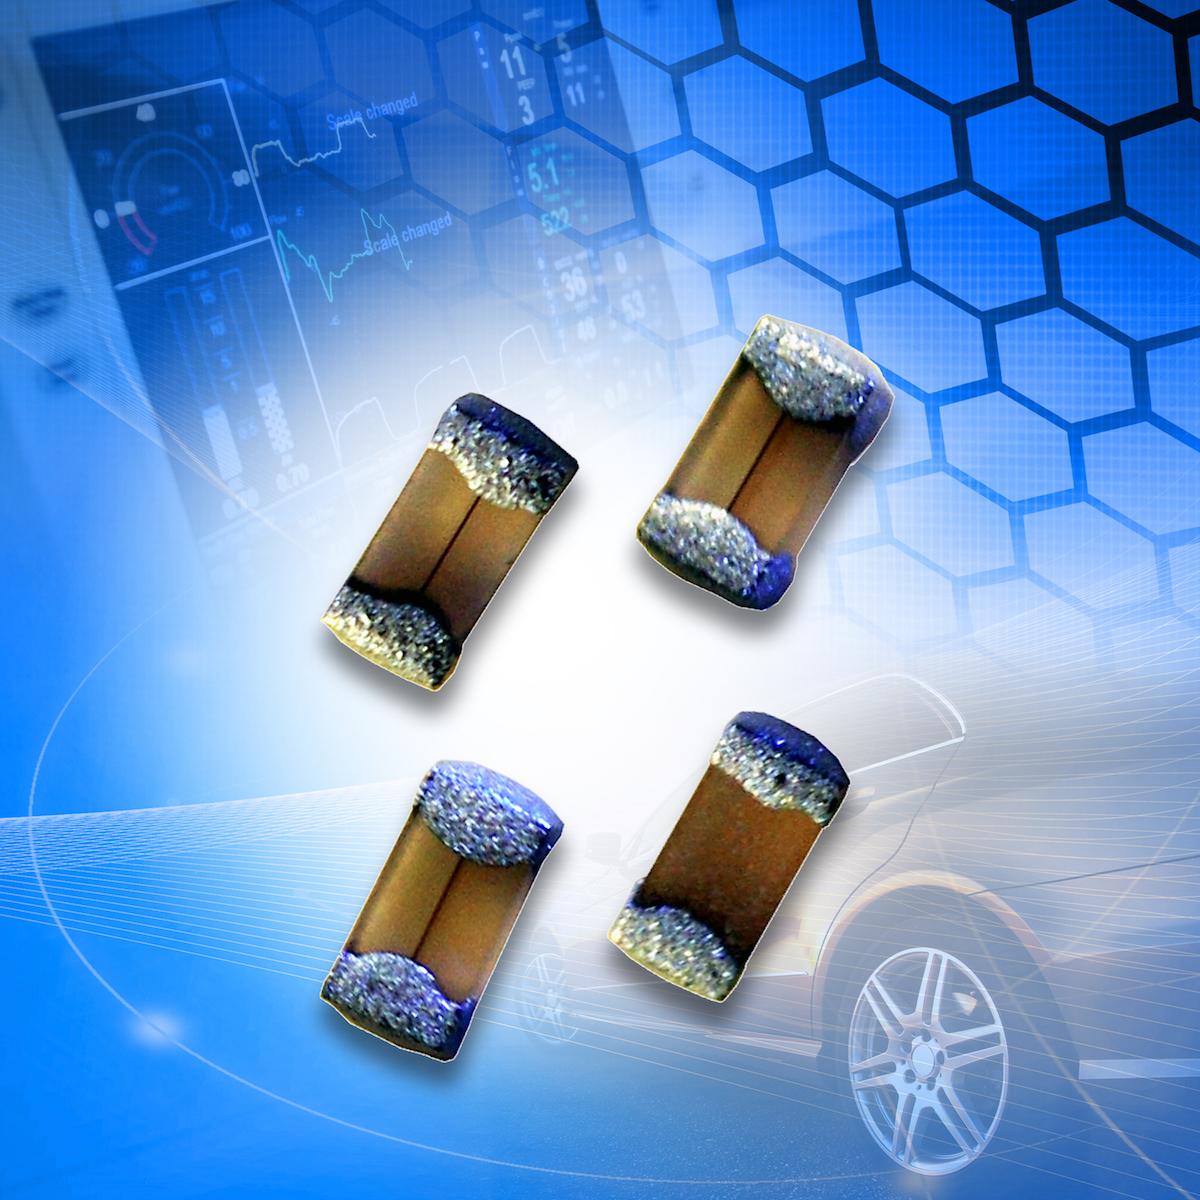 Avx Launches Hr Series Resistors